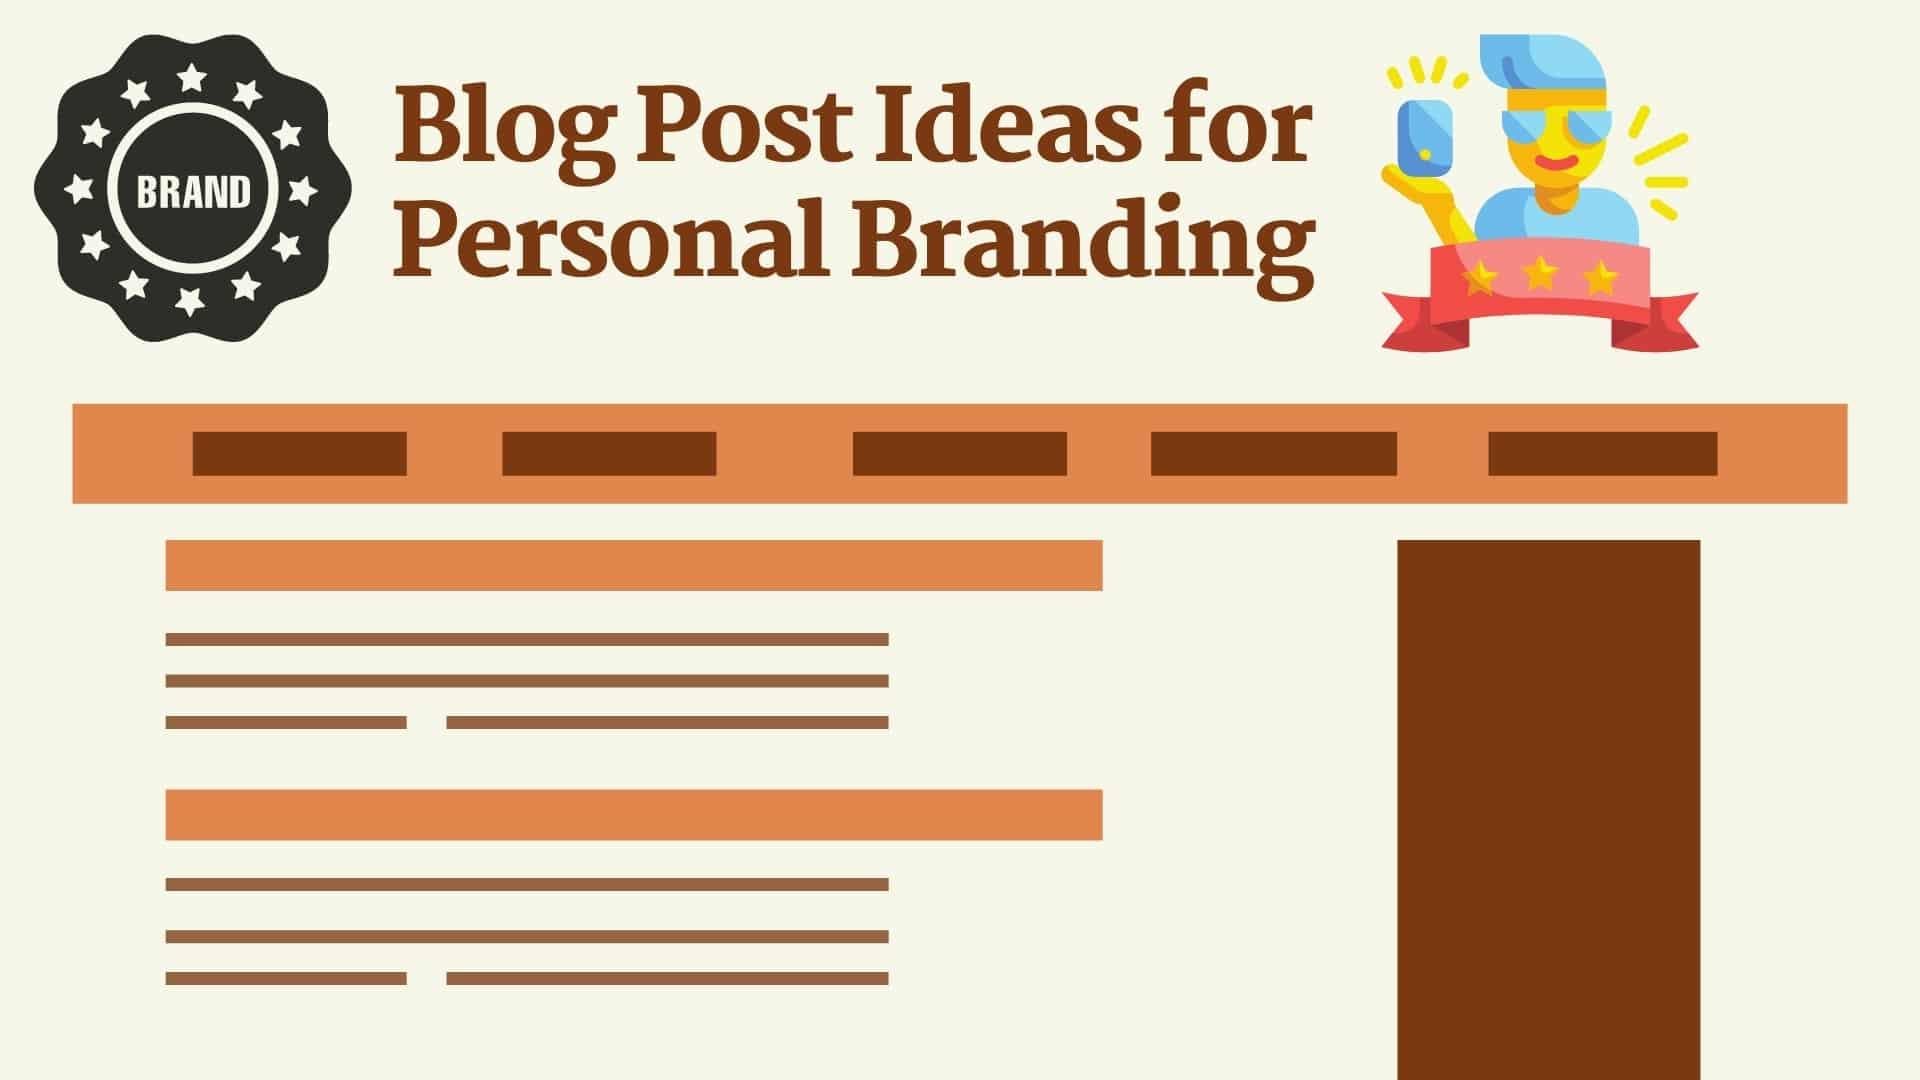 Personal Branding Blog Post Ideas - Find Blog Topic Ideas for Personal Branding Blogs